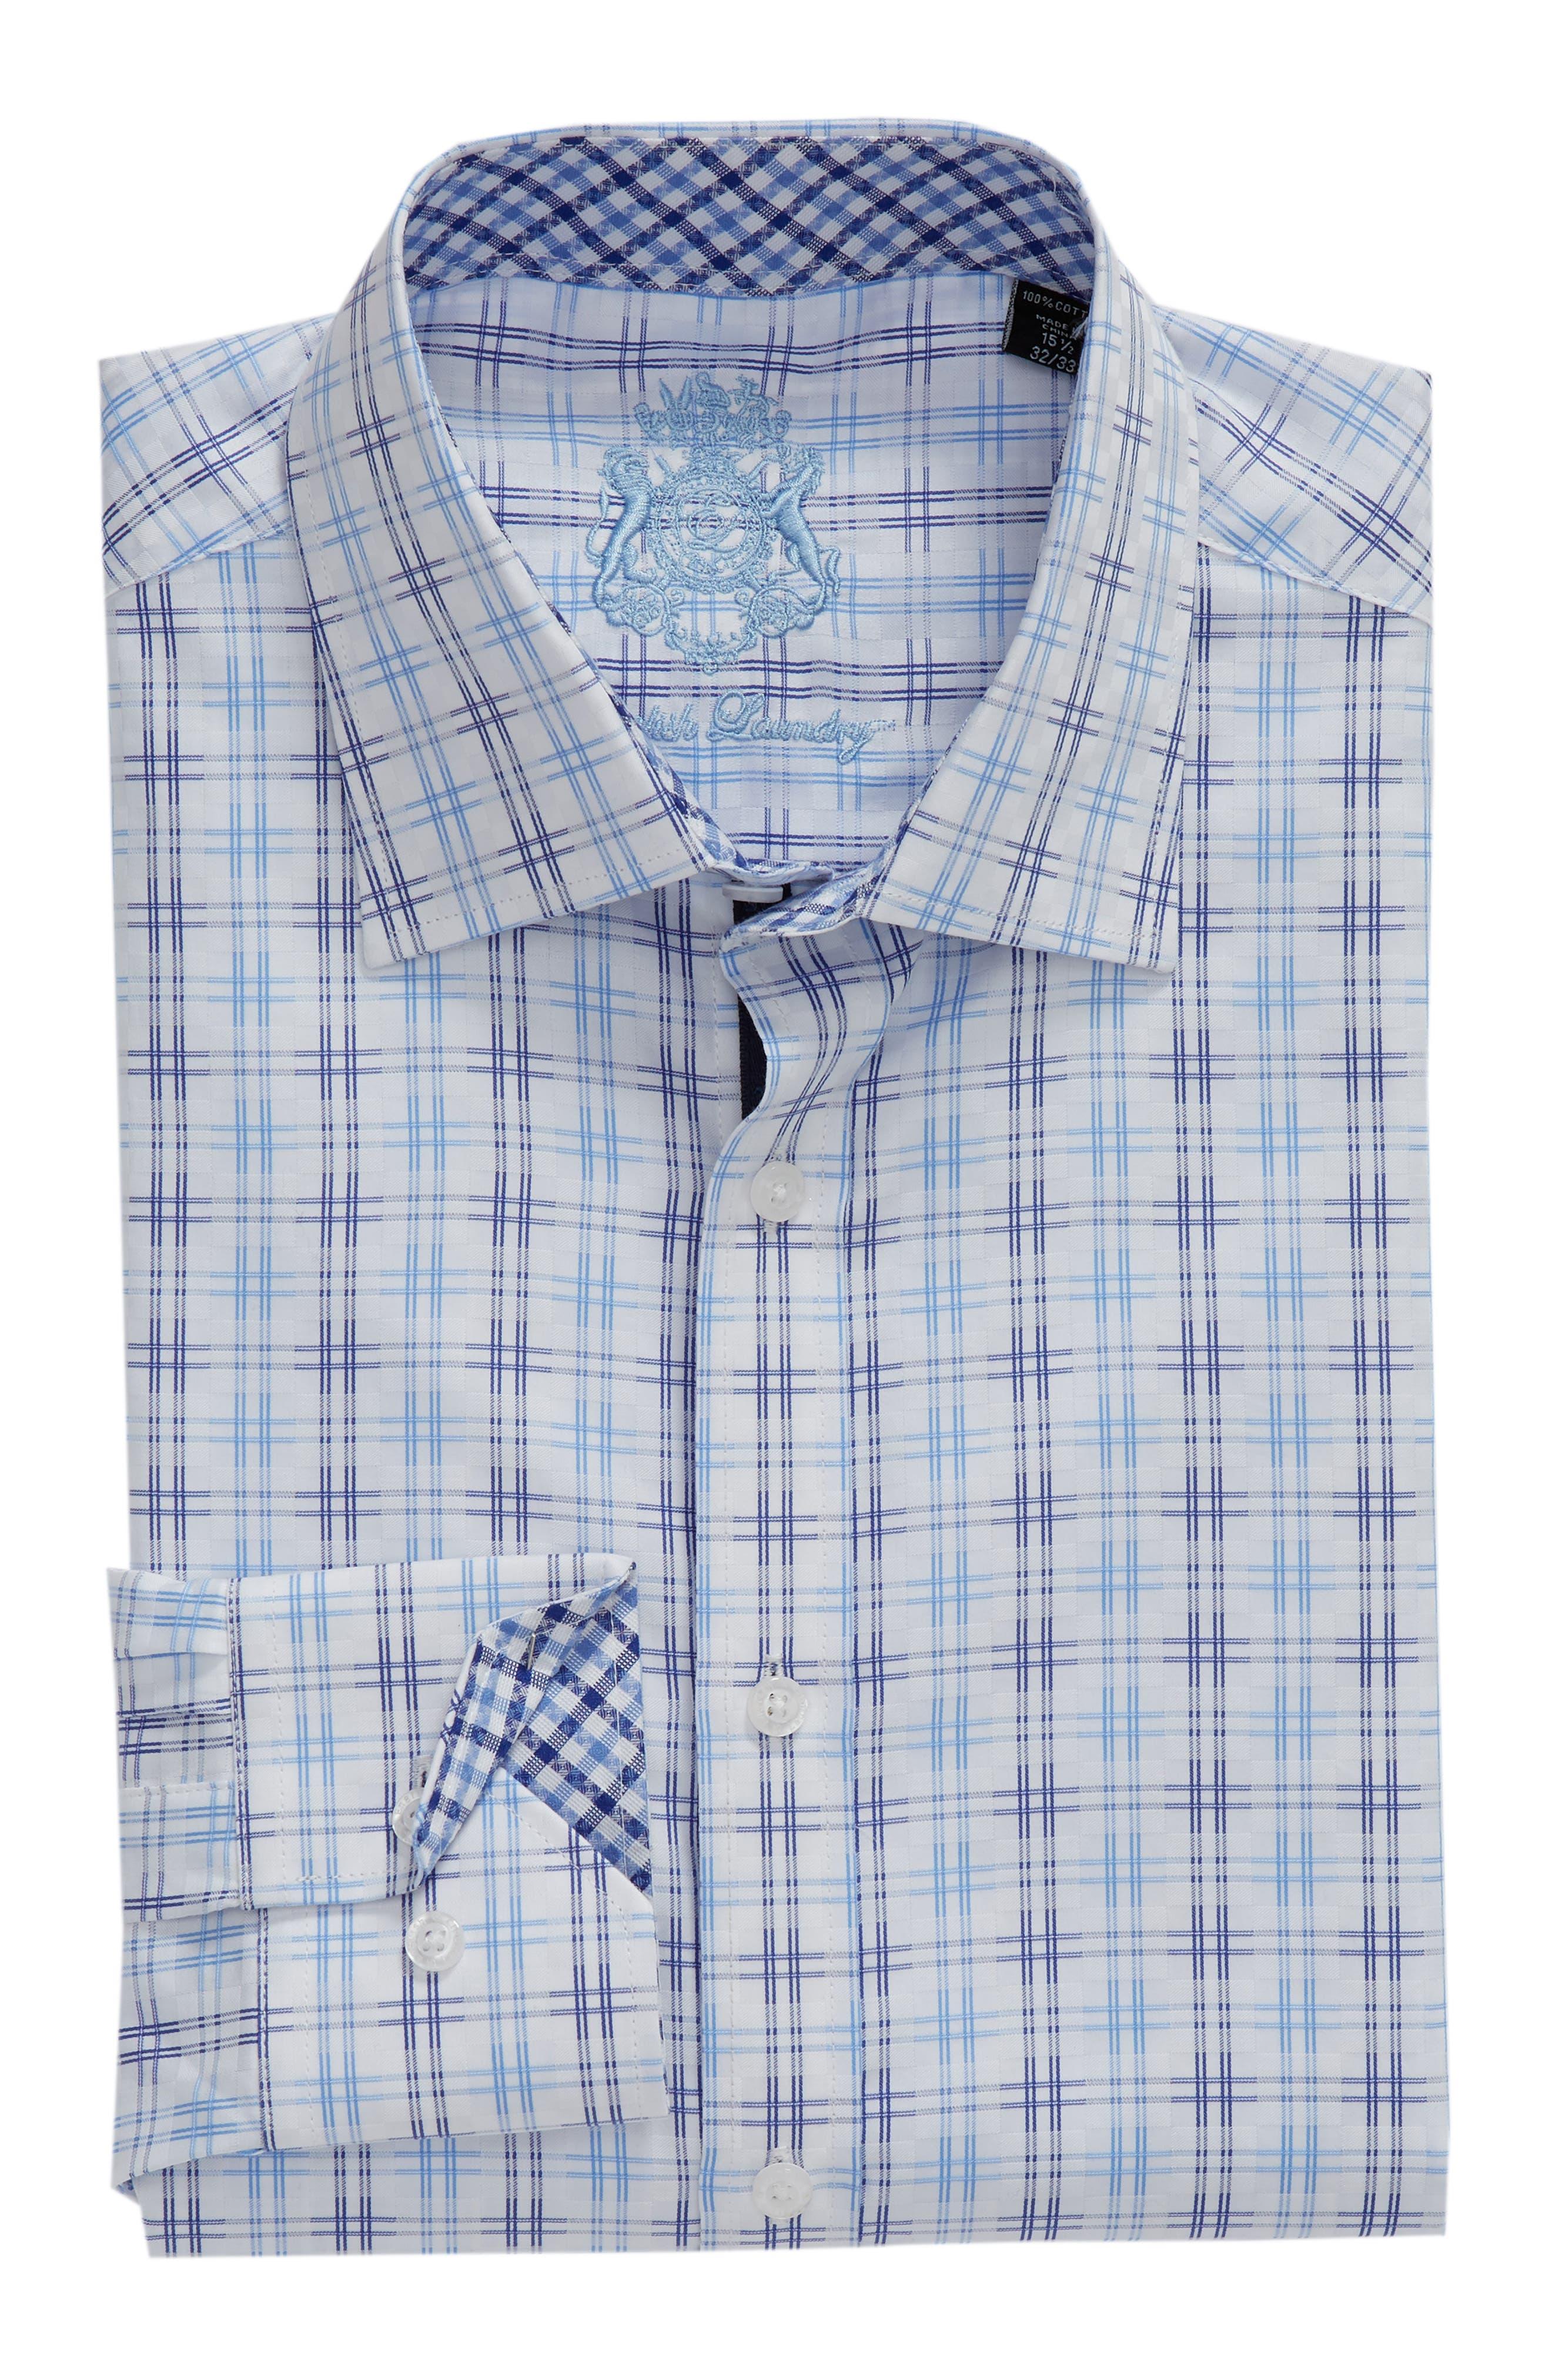 Regular Fit Solid Dress Shirt,                             Alternate thumbnail 5, color,                             BLUE